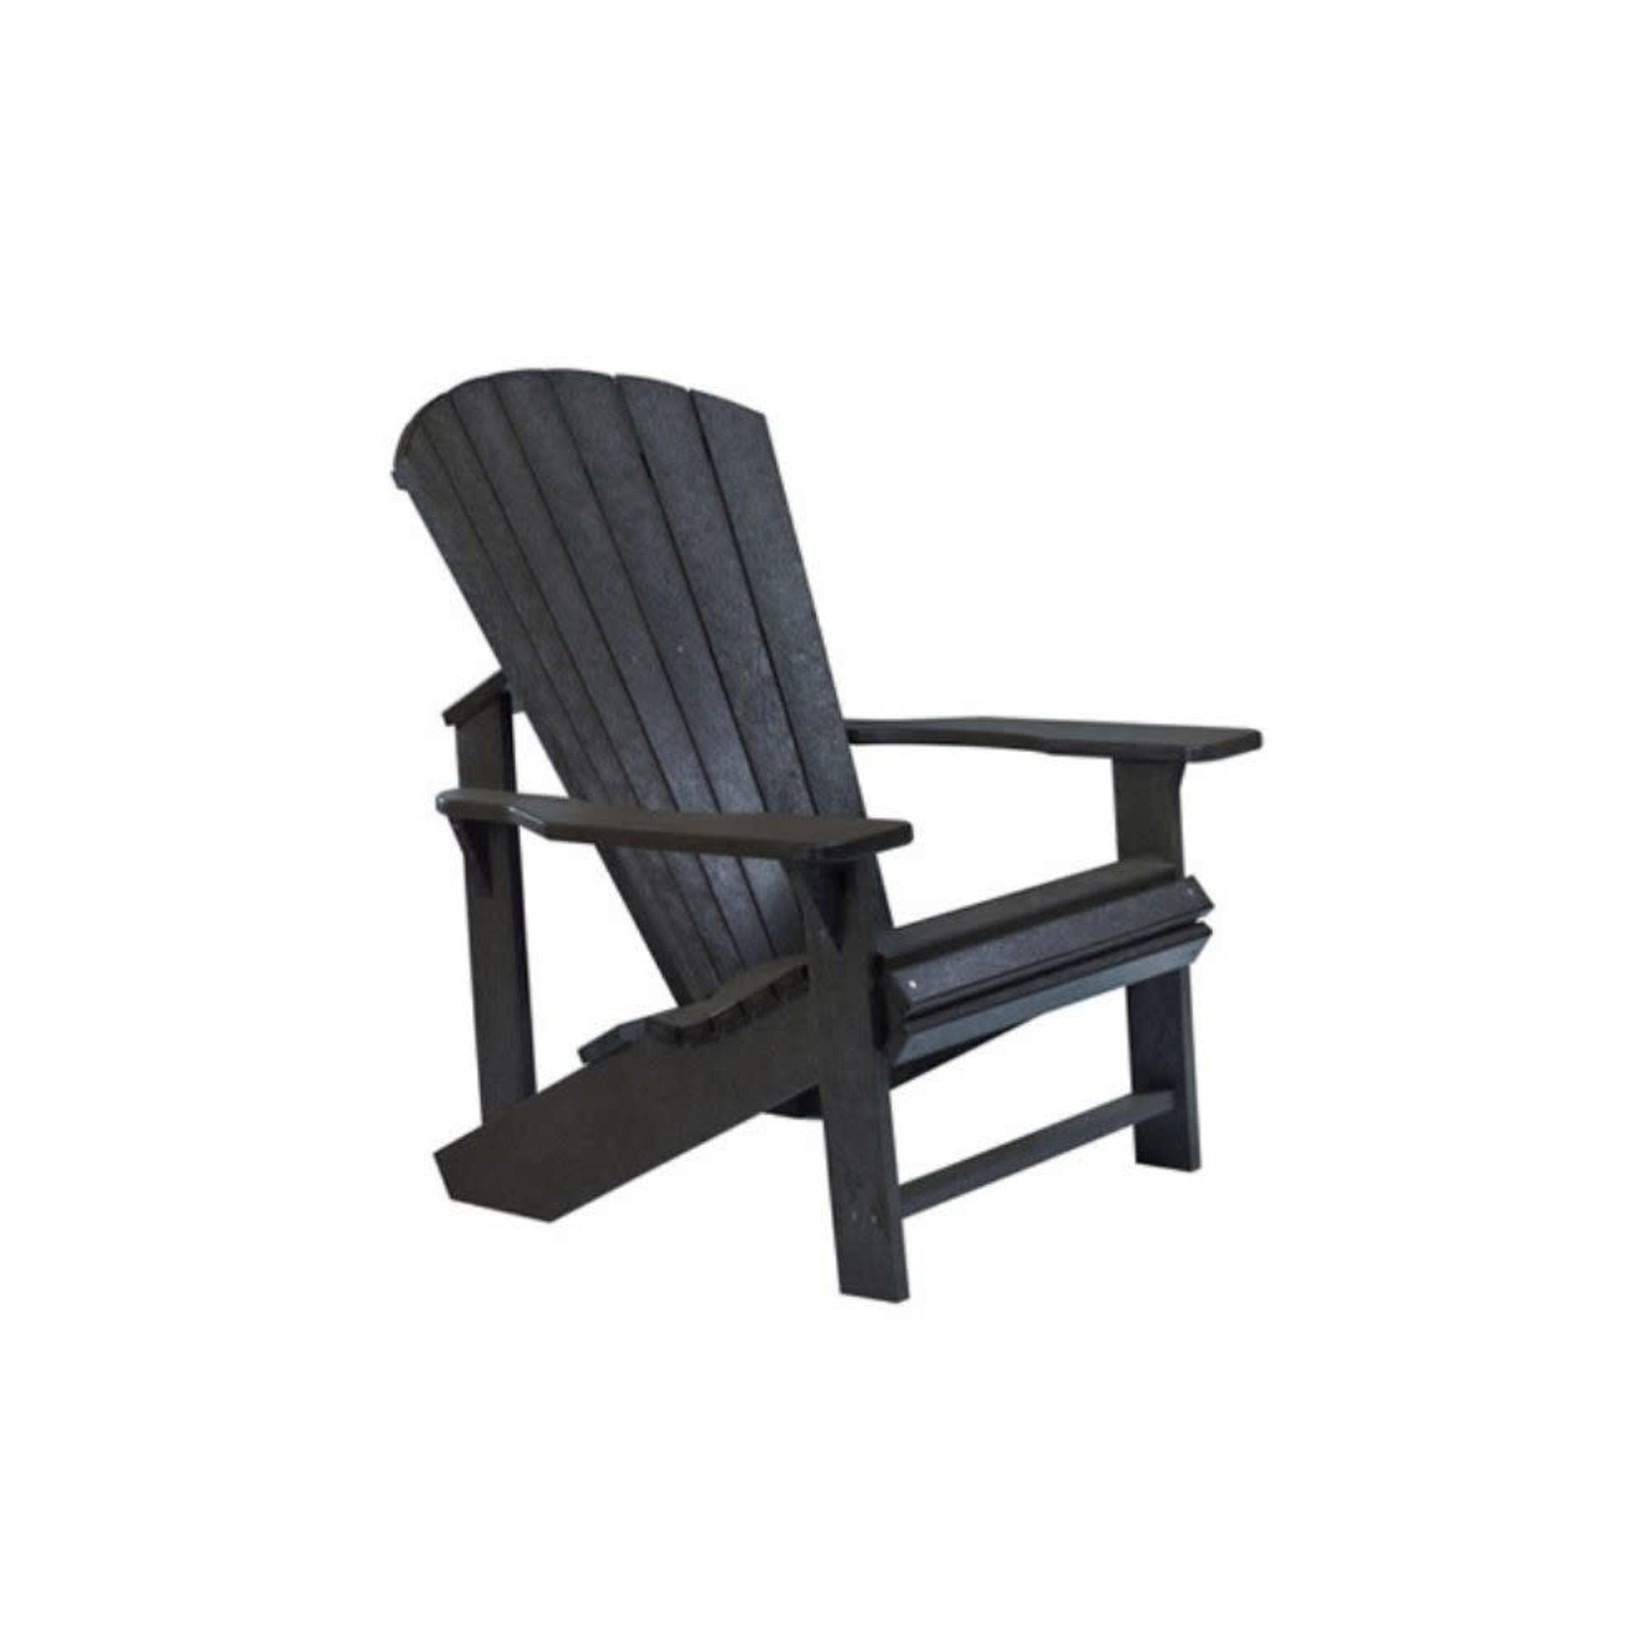 Classic Adirondack Chair Black 14